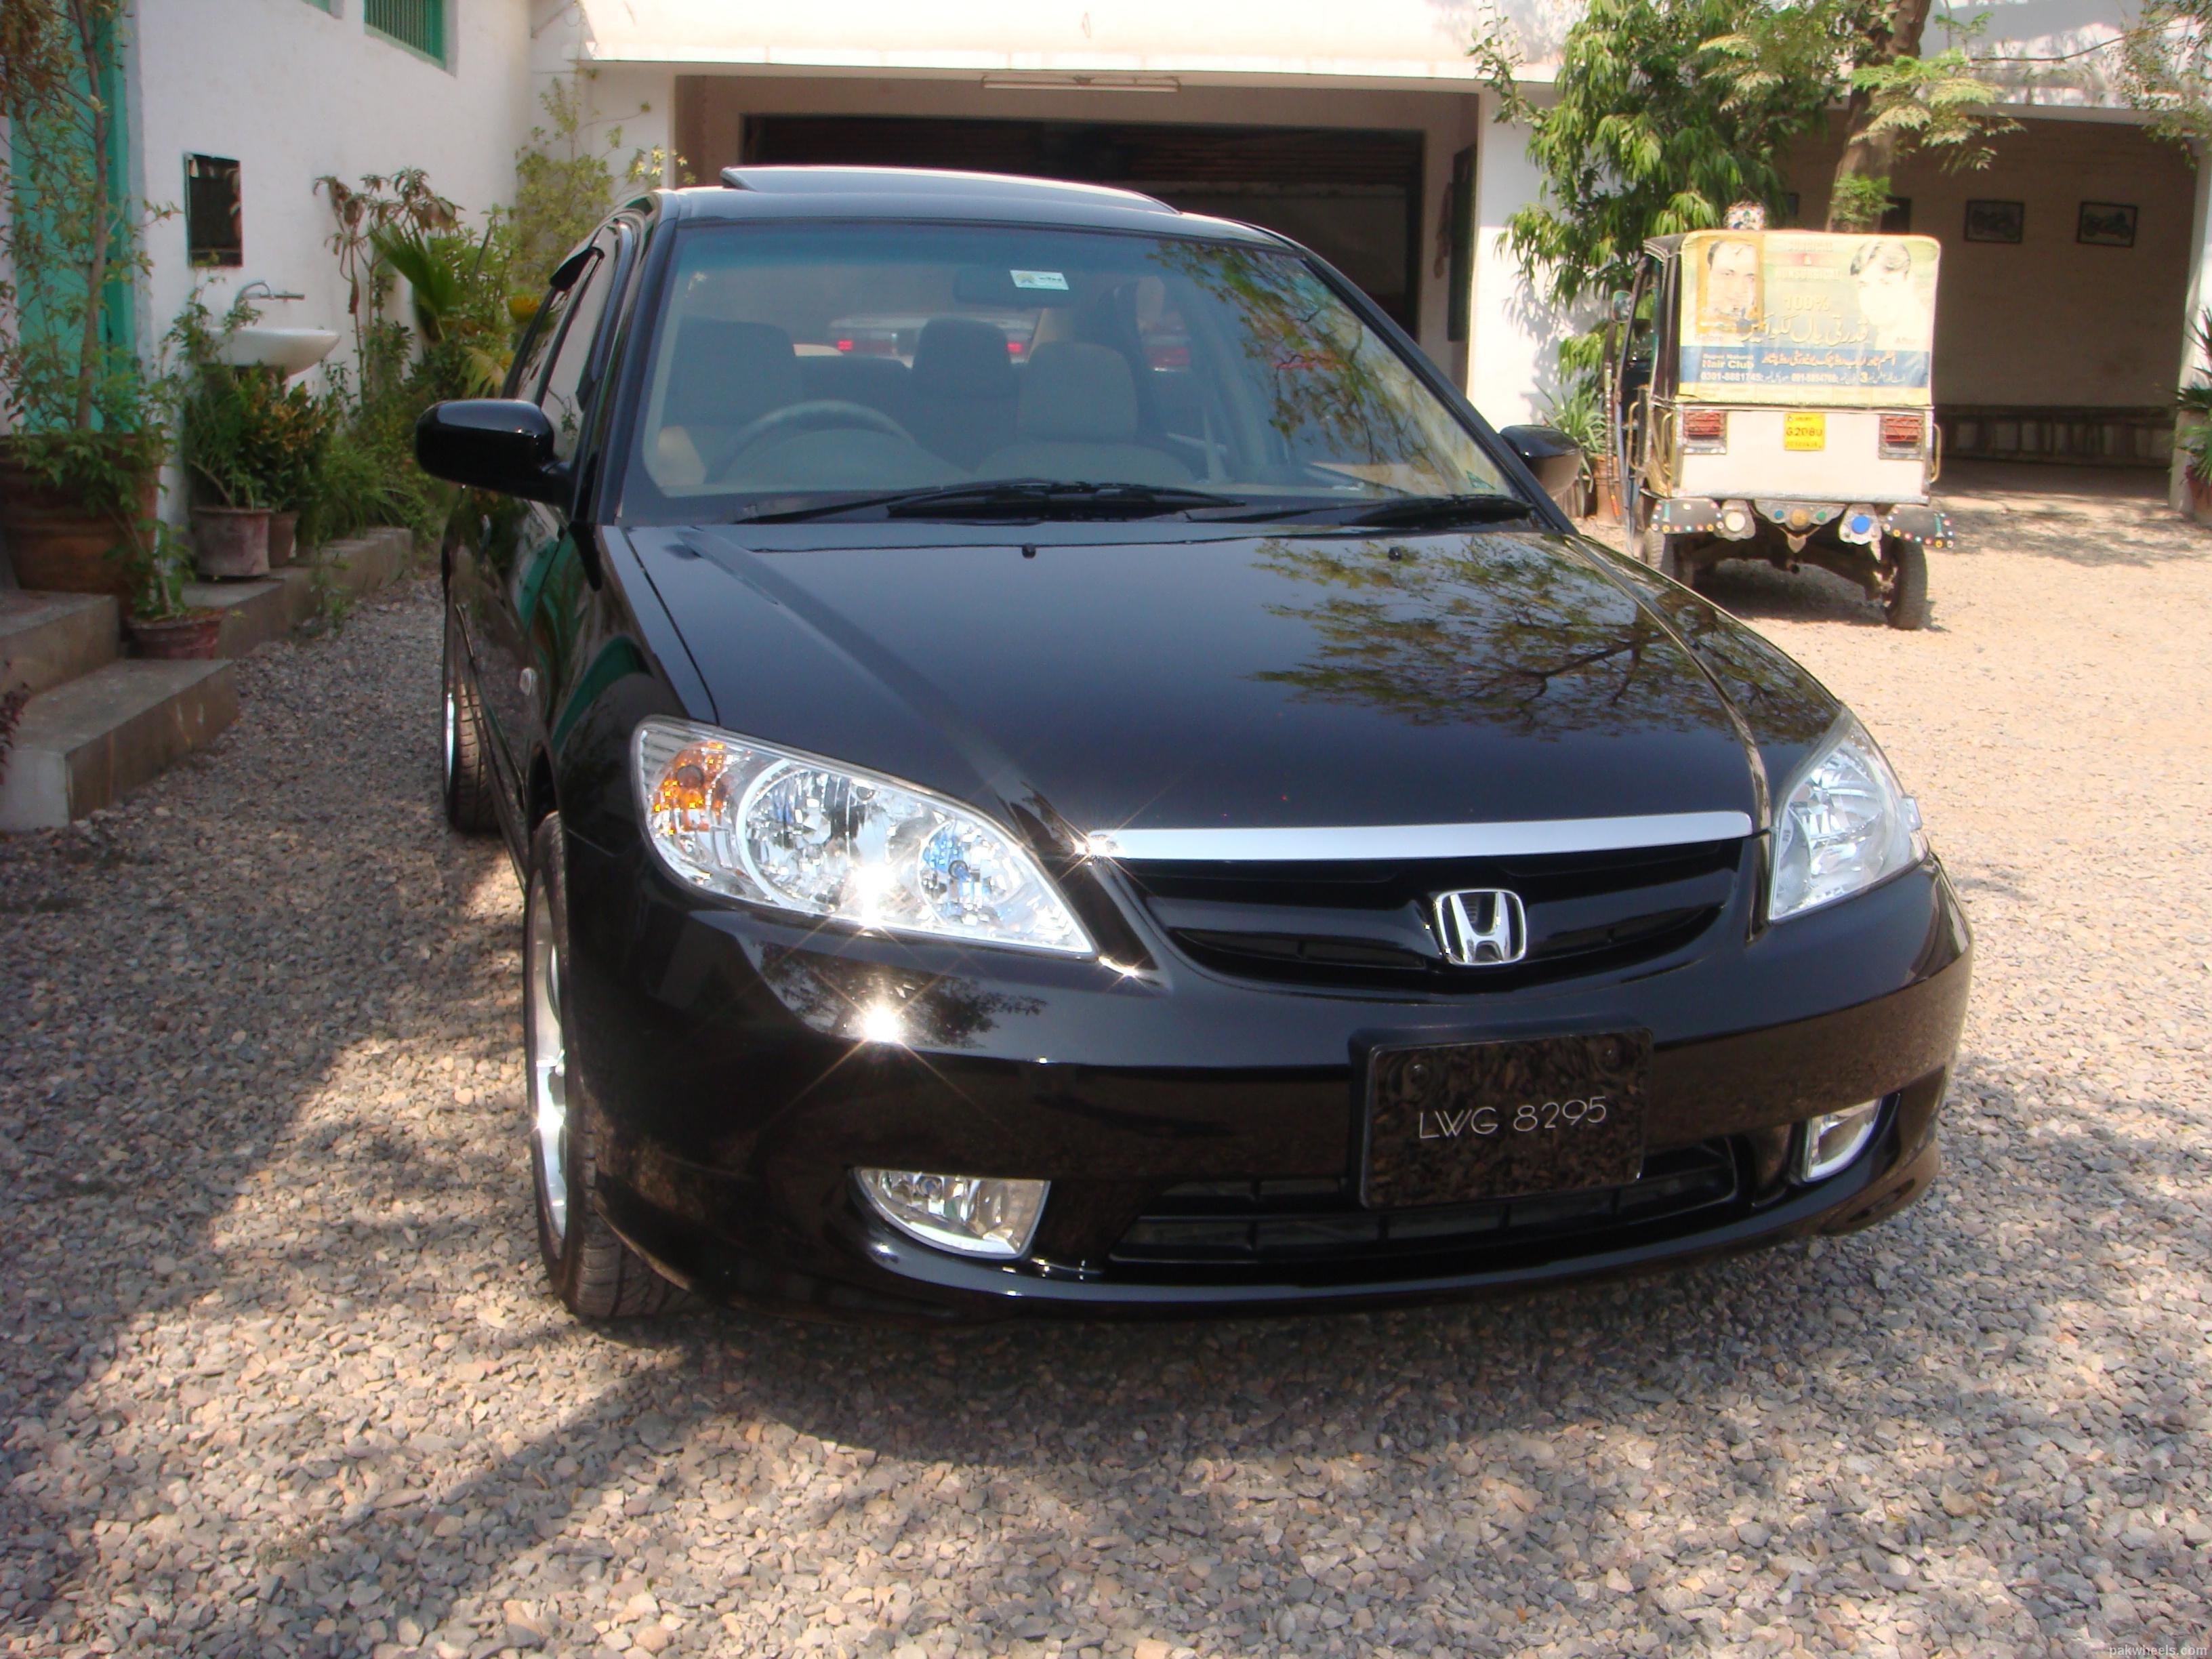 Honda Civic - 2005 Flame -  Image-1